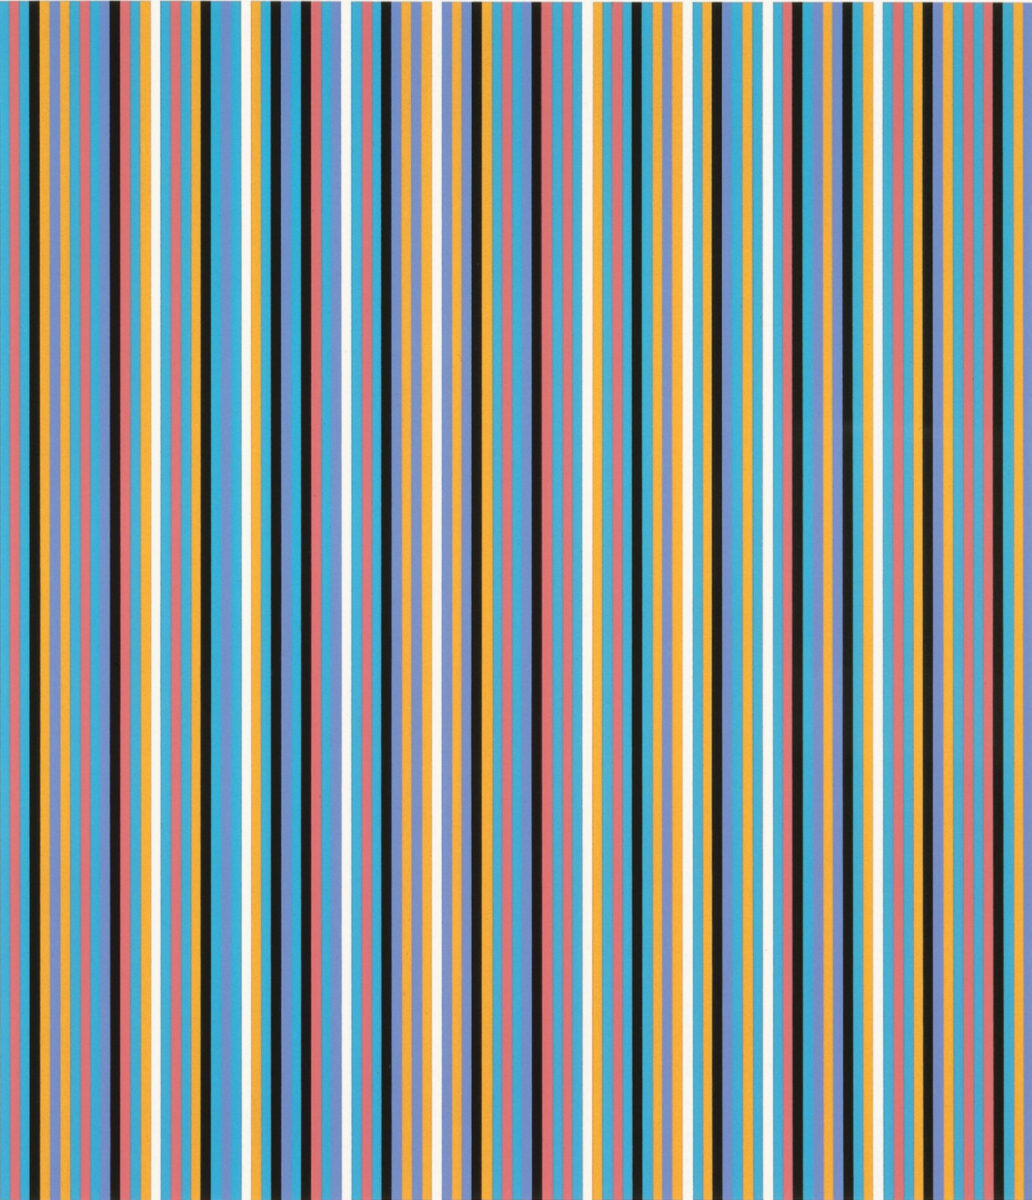 Bridget Riles Edge of Light, original screenprint in colours for sale